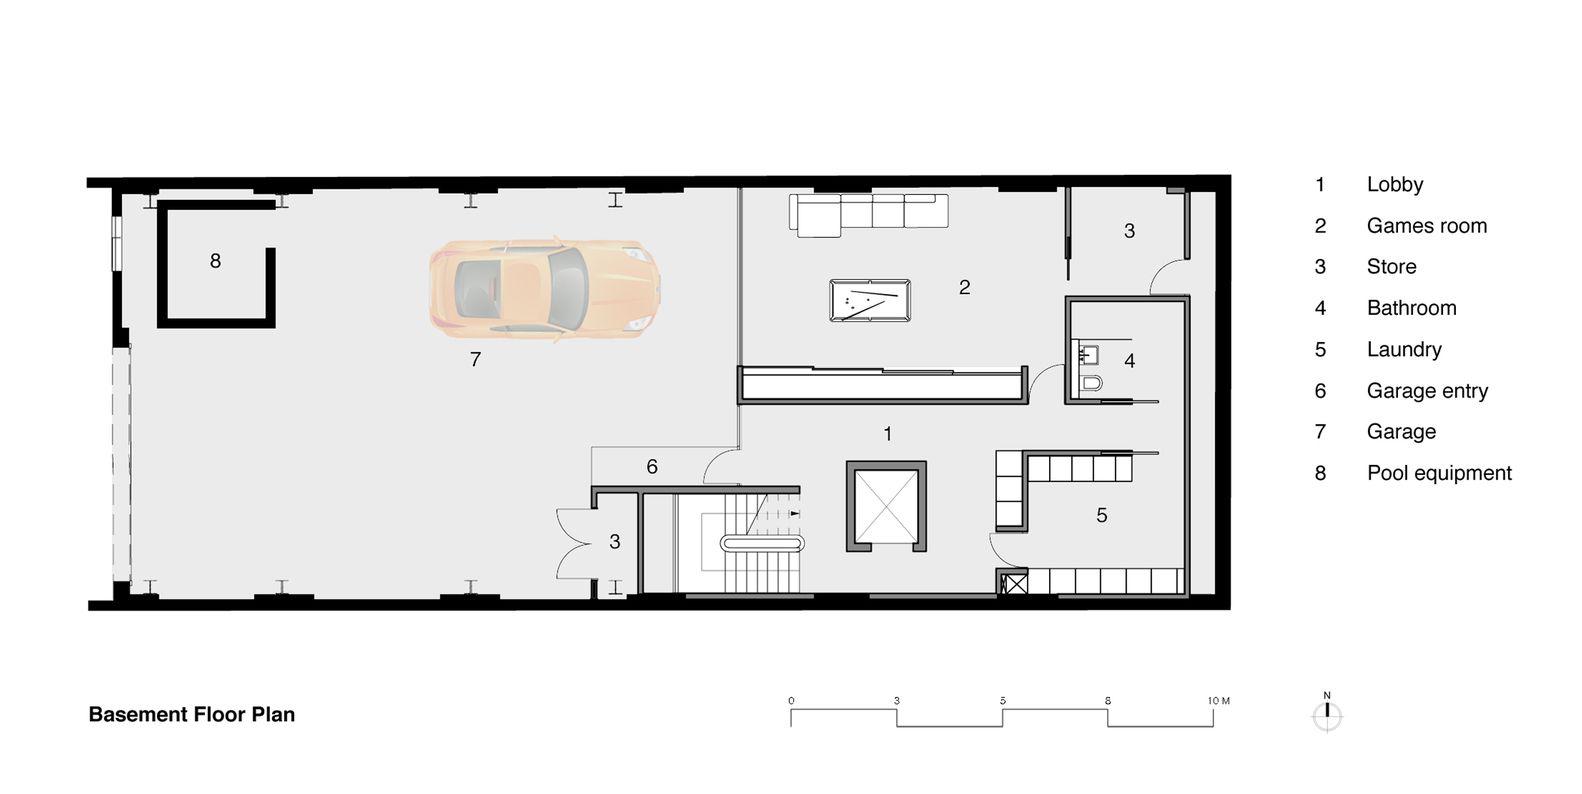 W house /   MCK architects  .  item 17